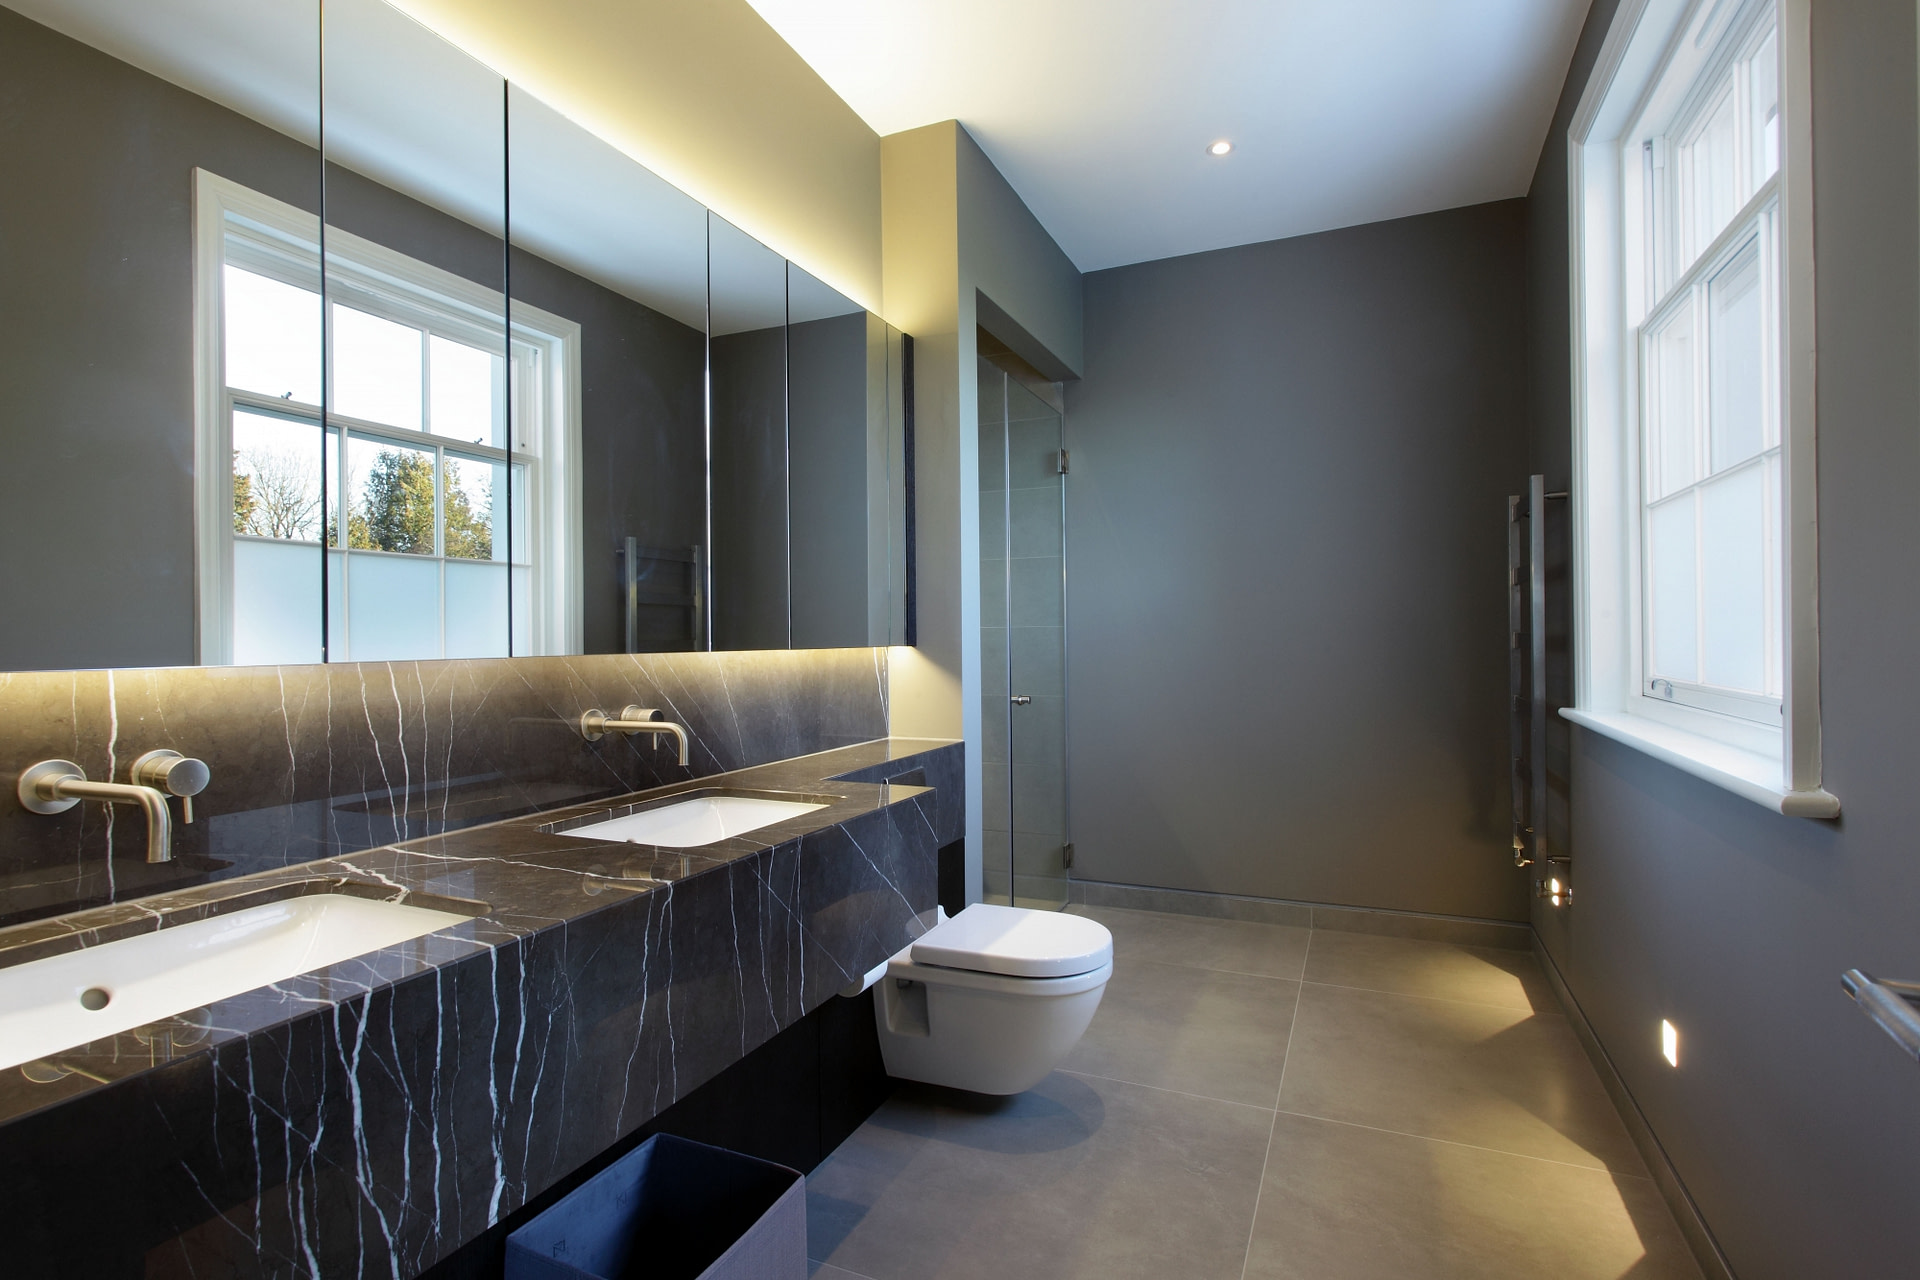 31 Holmewood Ridge bathroom